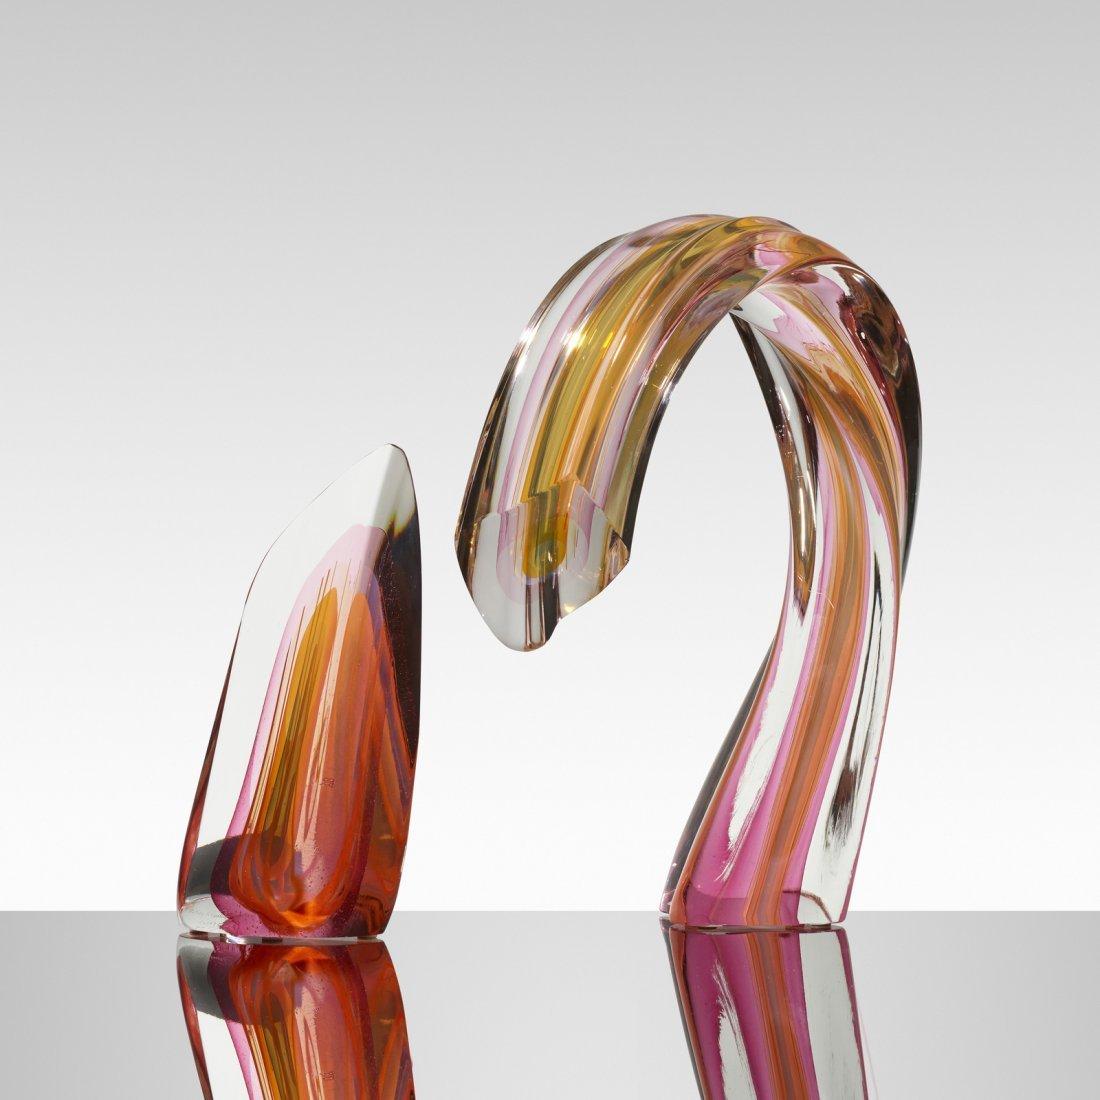 Harvey K. Littleton, Red/Amber Descending Form